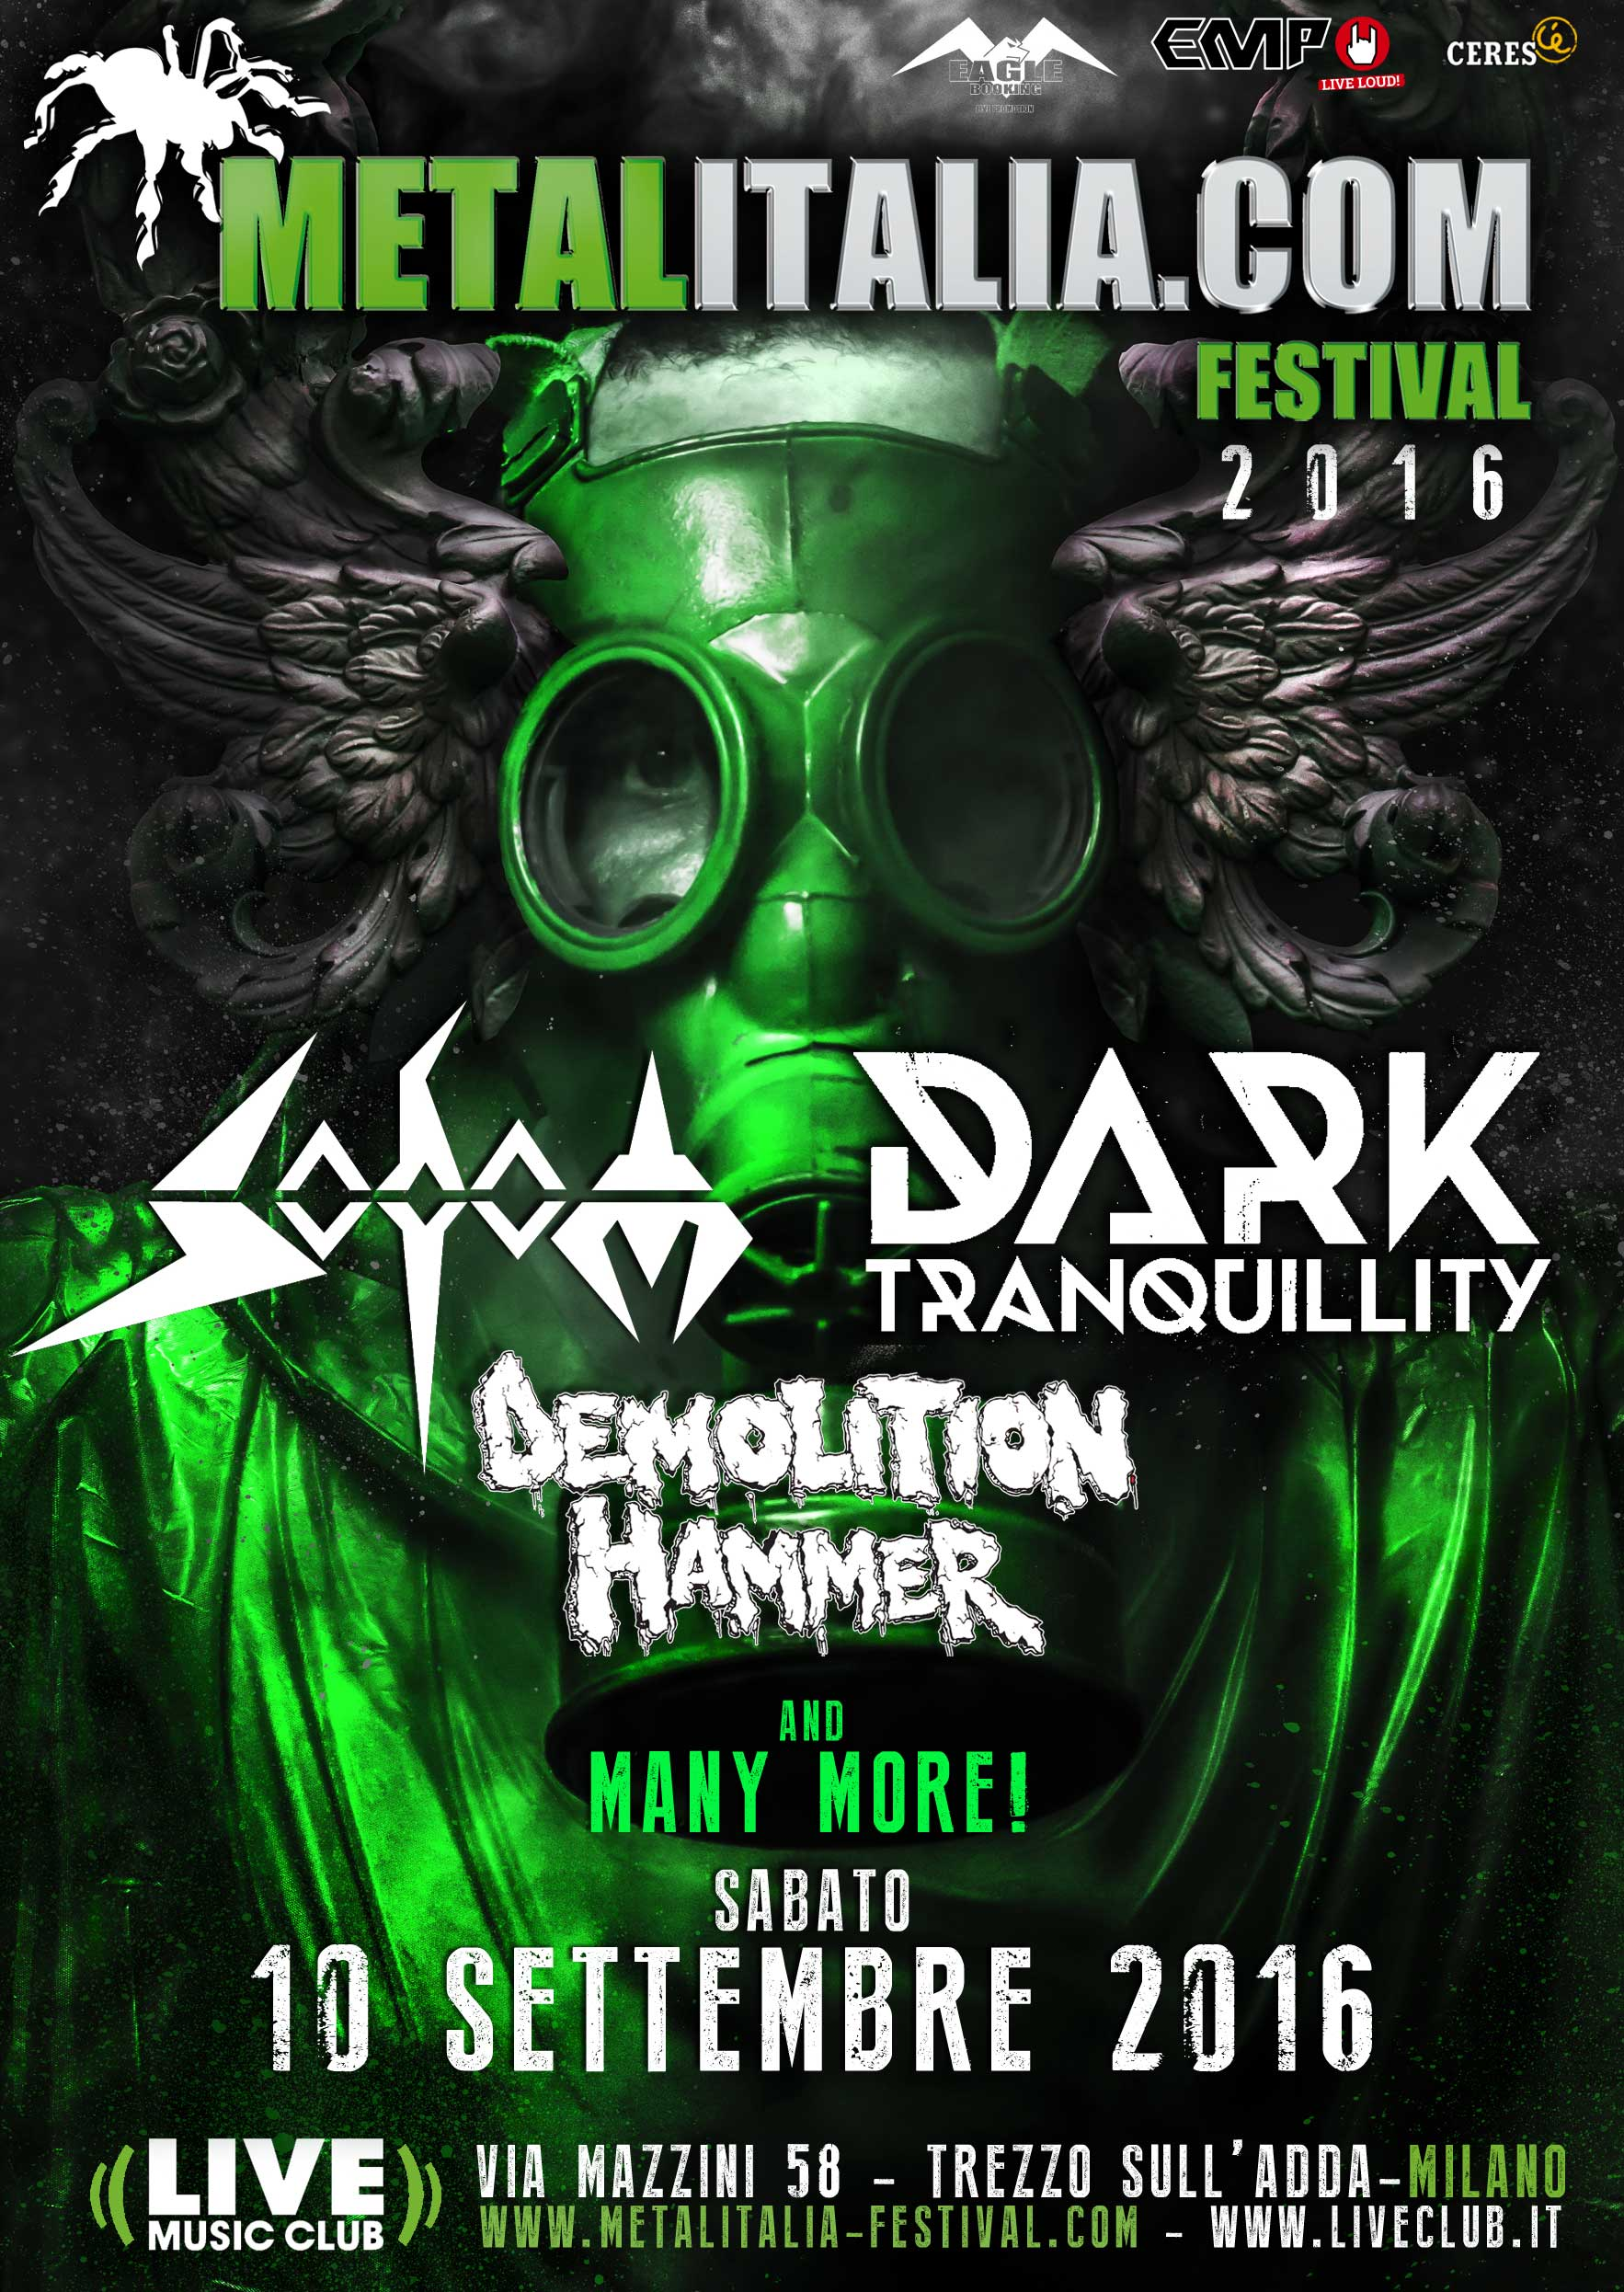 metalitalia festival 2016 - seconda locandina